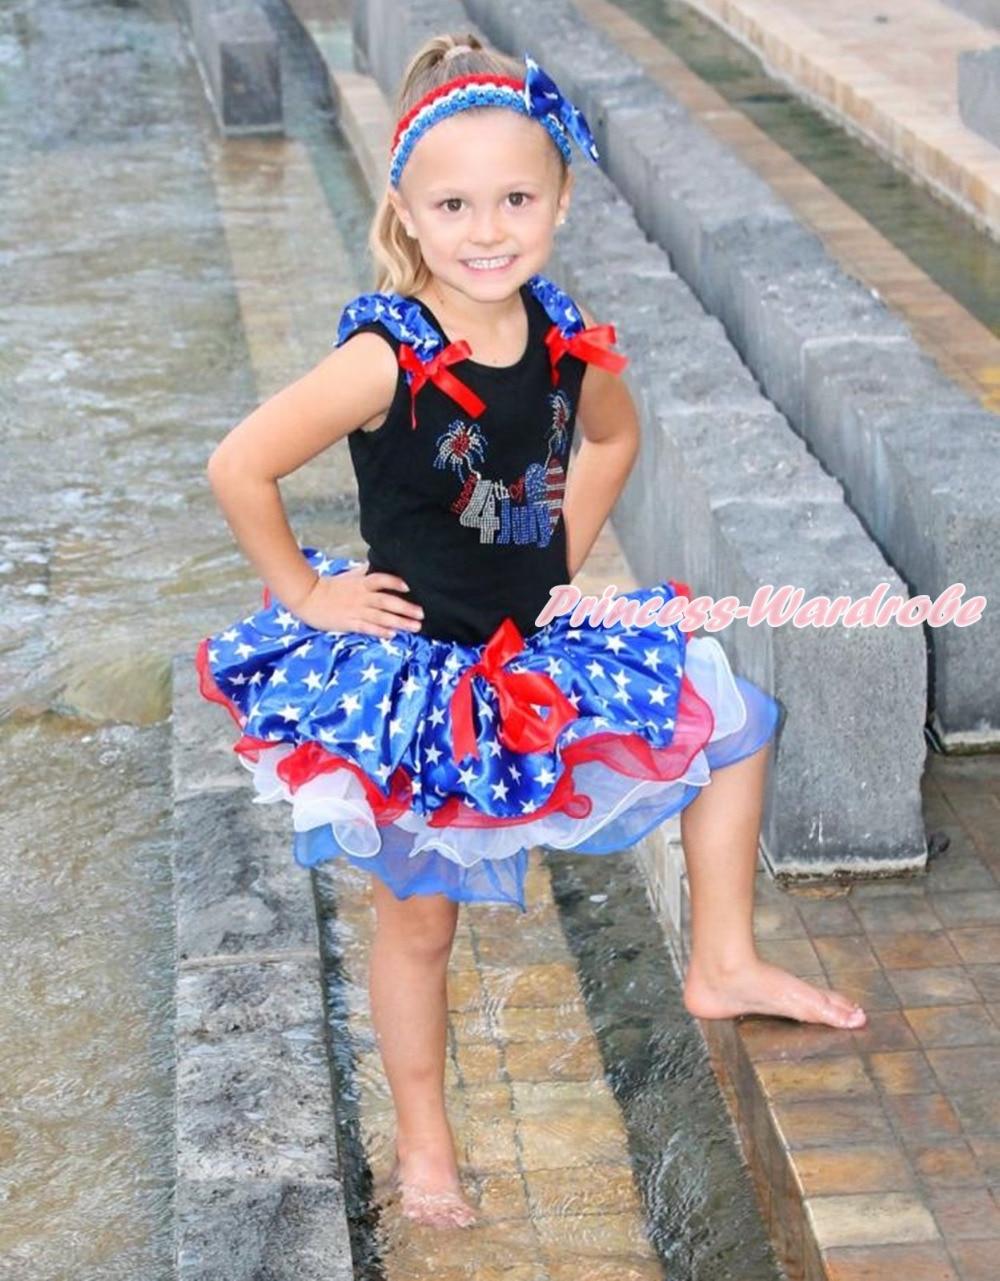 Rhinestone Happy 4th July Black Top Patriotic Star Red White Petal Skirt NB-8Y MAMH204 светильник потолочный sonex mortia 142